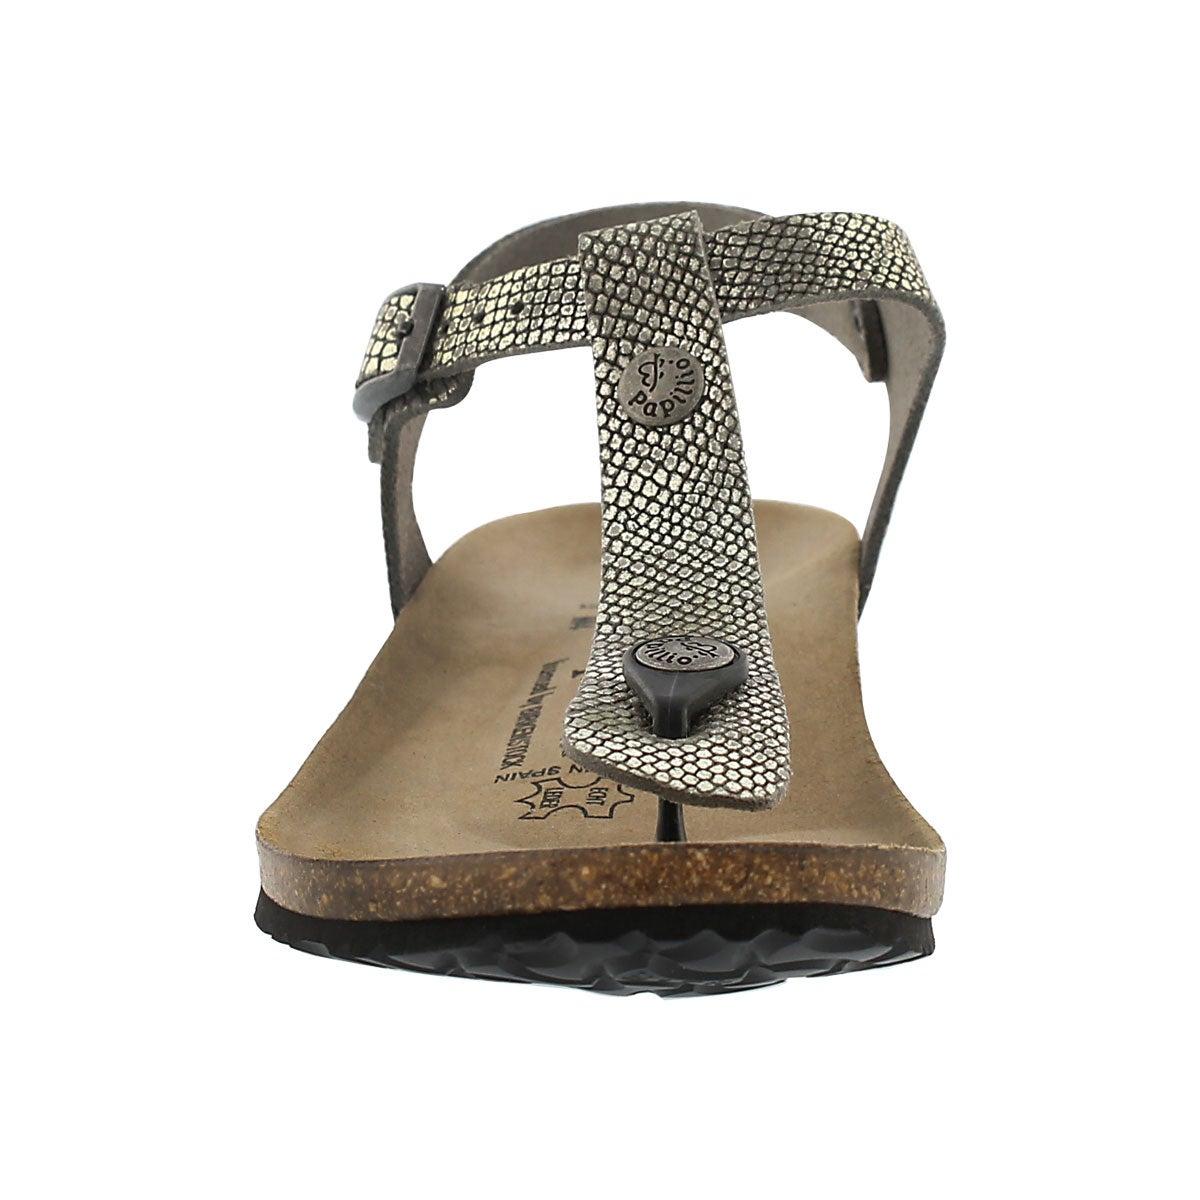 Lds Ashley grey python thong sandal-Narr